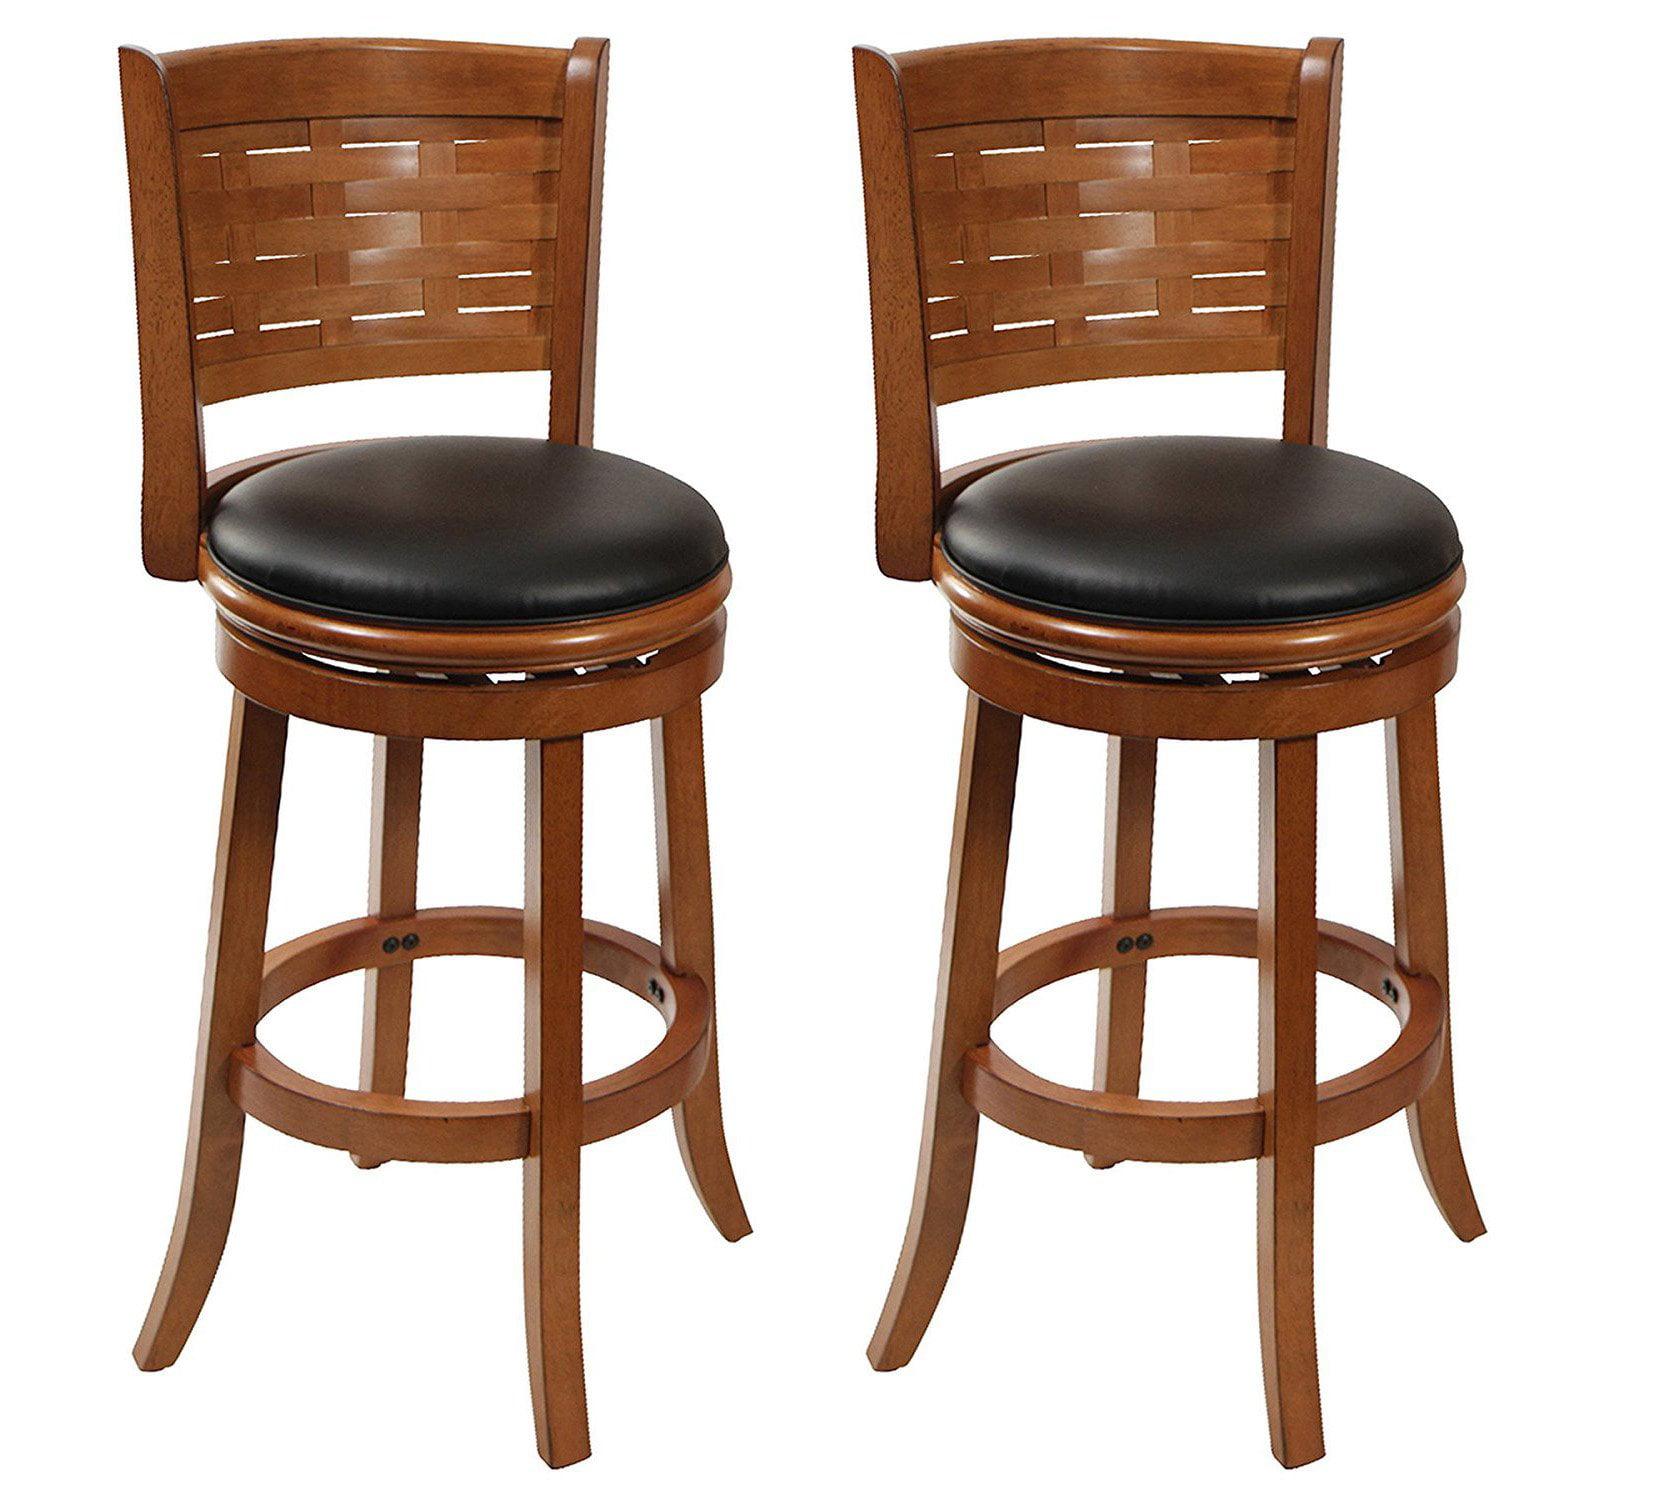 Sensational Boraam 29 Countertop Sumatra Faux Leather Swivel Bar Stool Brush Oak 2 Pack Caraccident5 Cool Chair Designs And Ideas Caraccident5Info